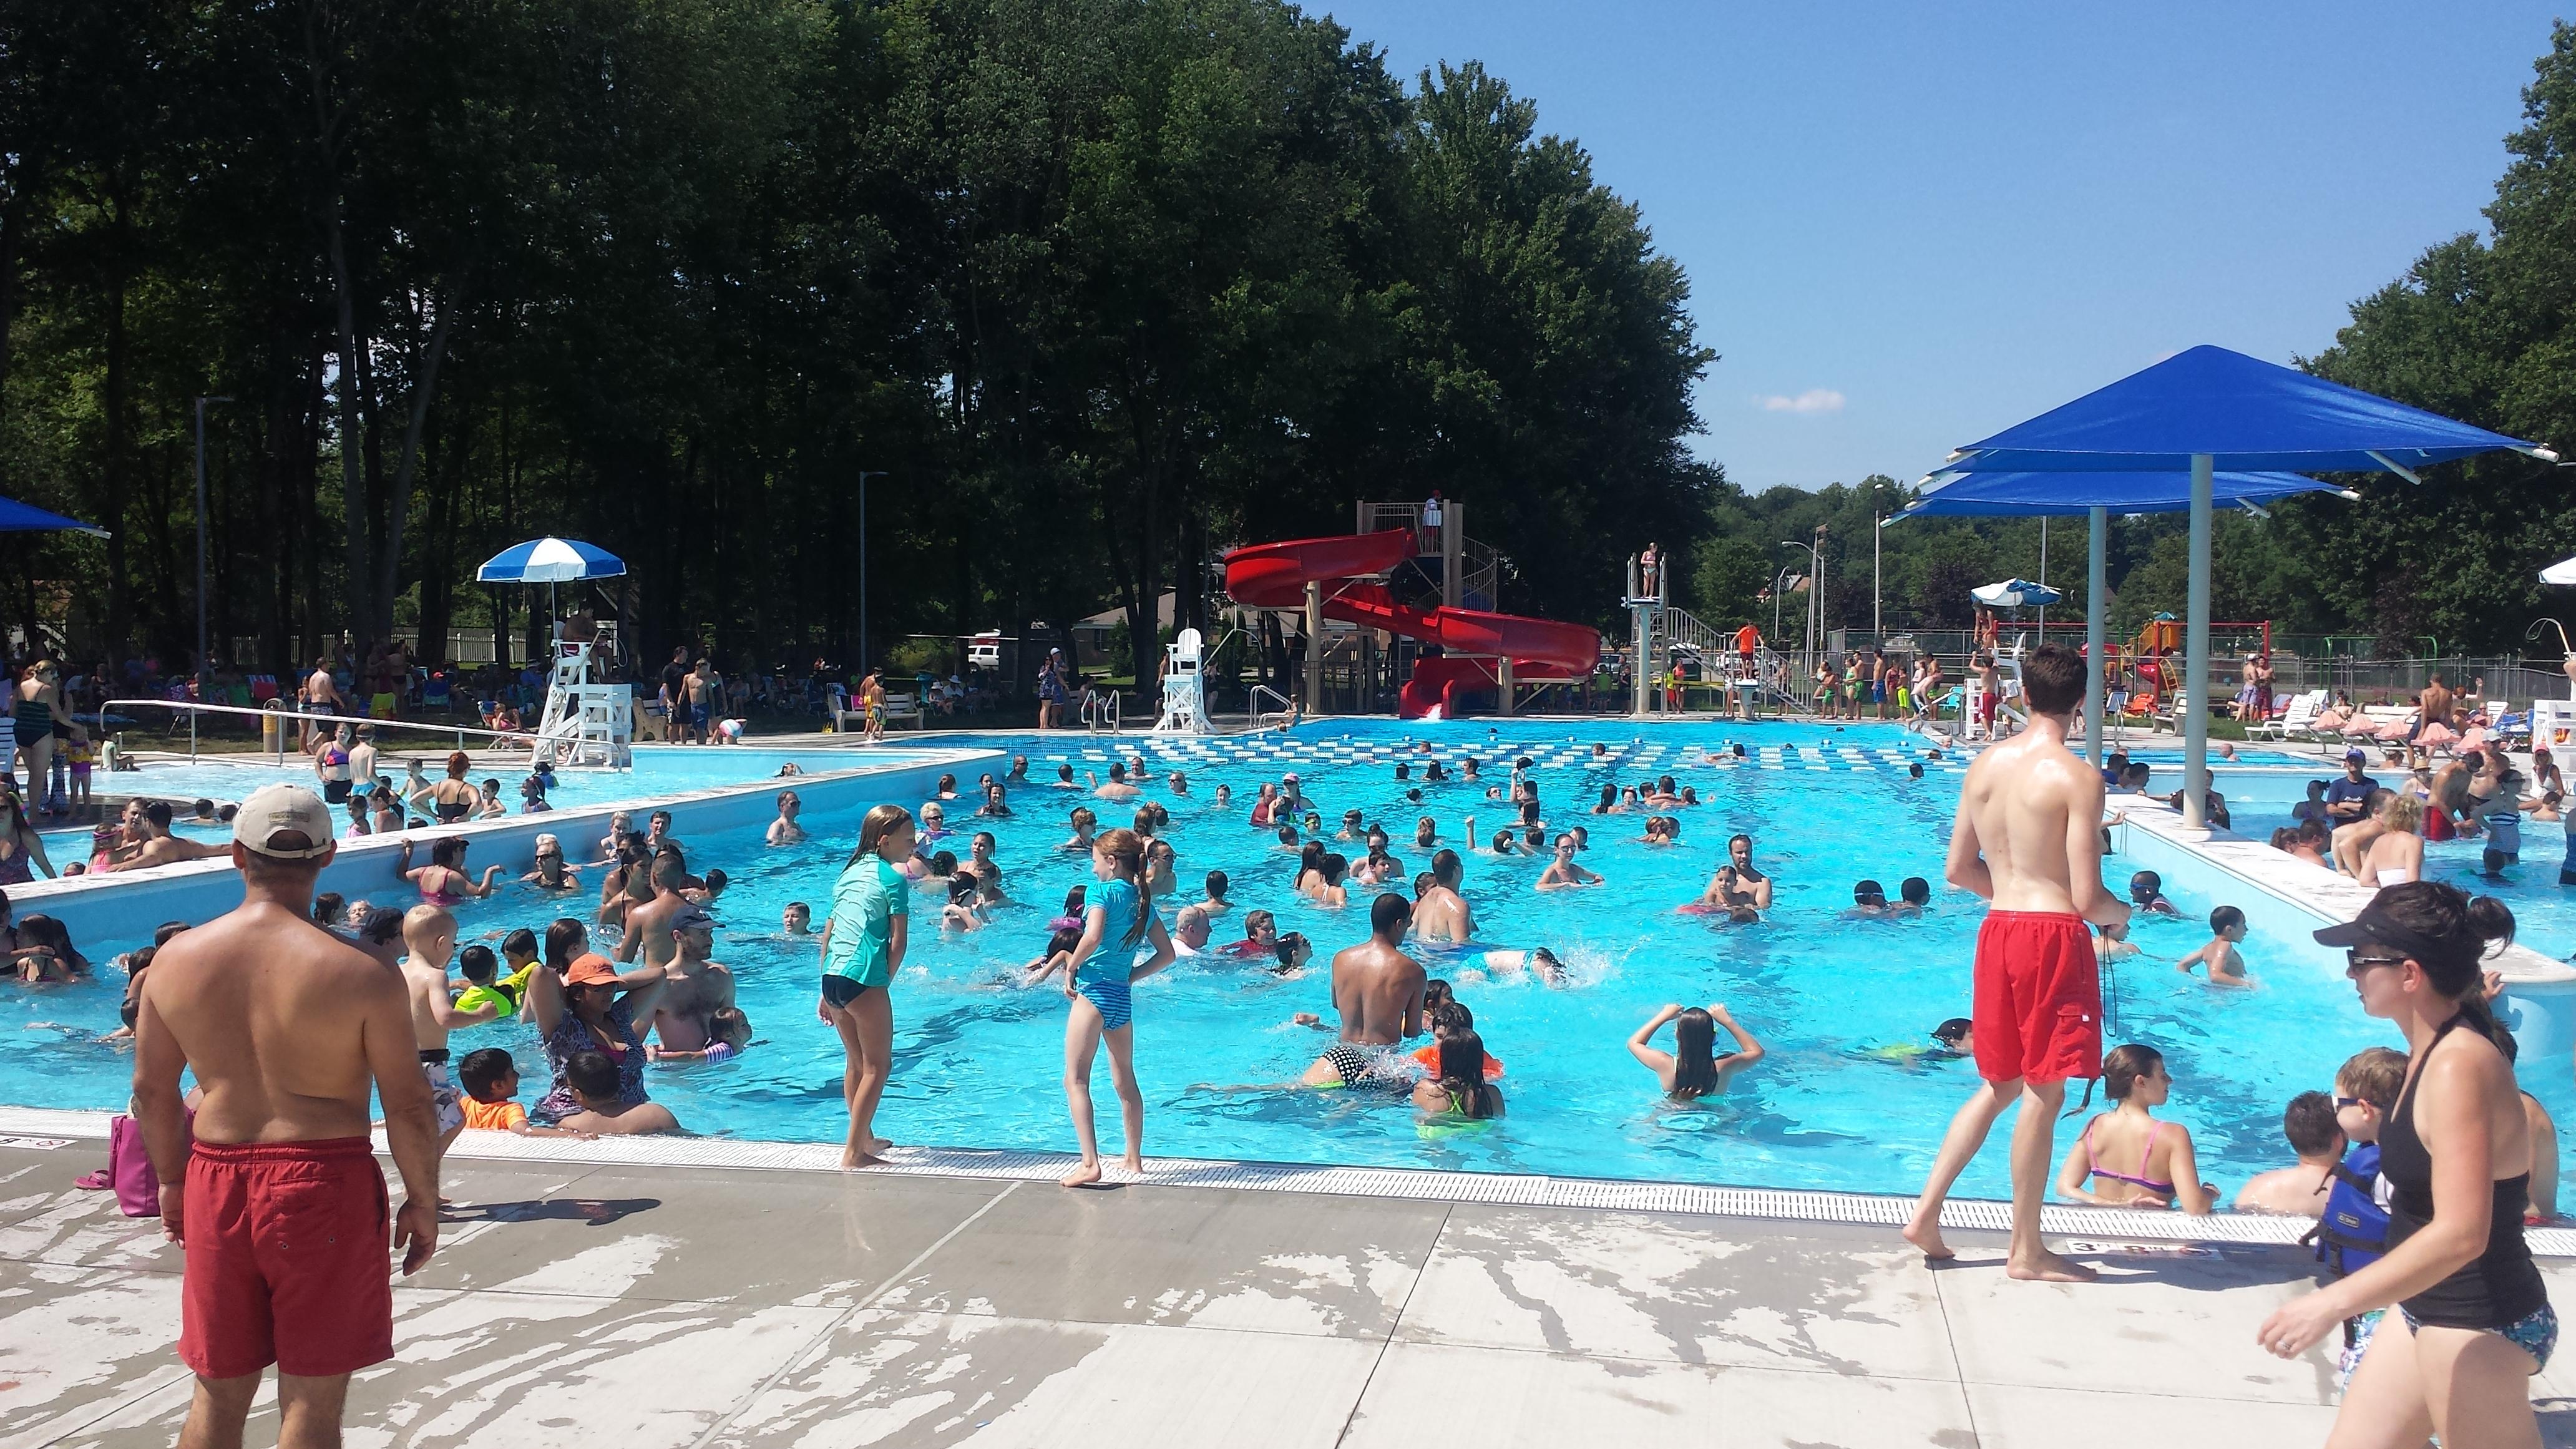 Morris Township Is Hiring Lifeguards And Swim Instructors Morristown Nj News Tapinto